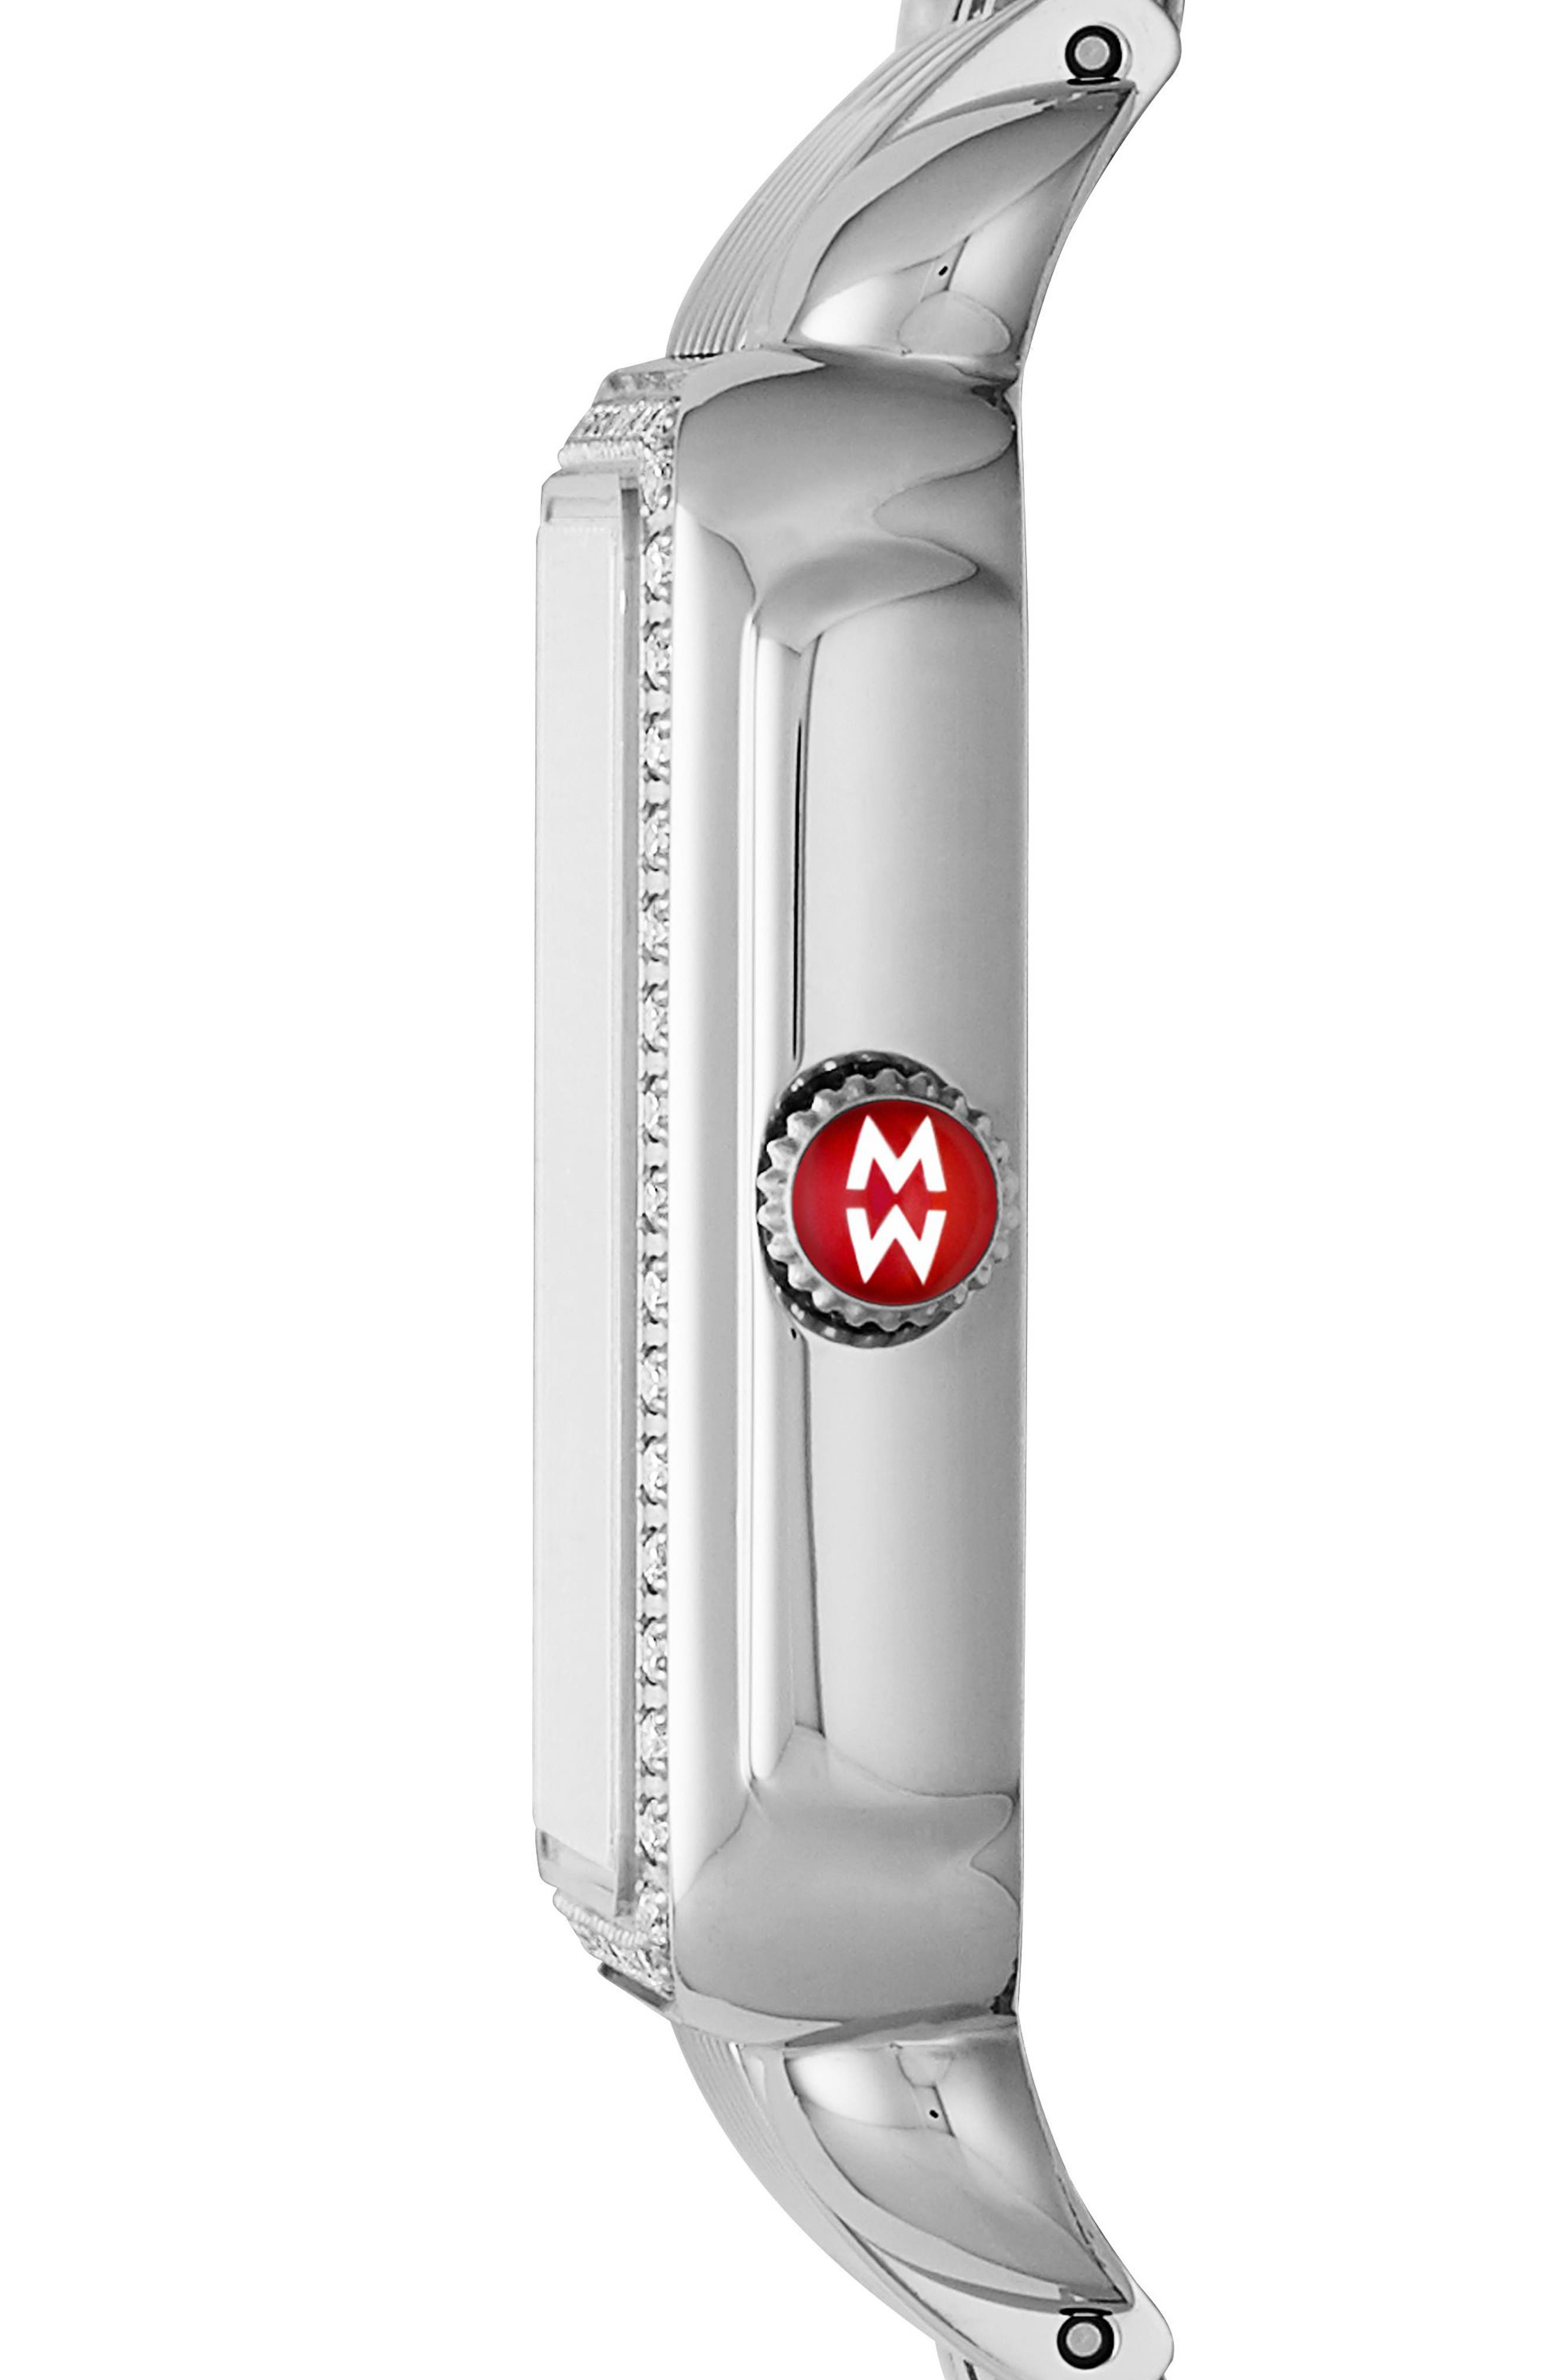 Deco II Mid Uptown Diamond Dial Watch Head, 26mm x 28mm,                             Alternate thumbnail 2, color,                             040